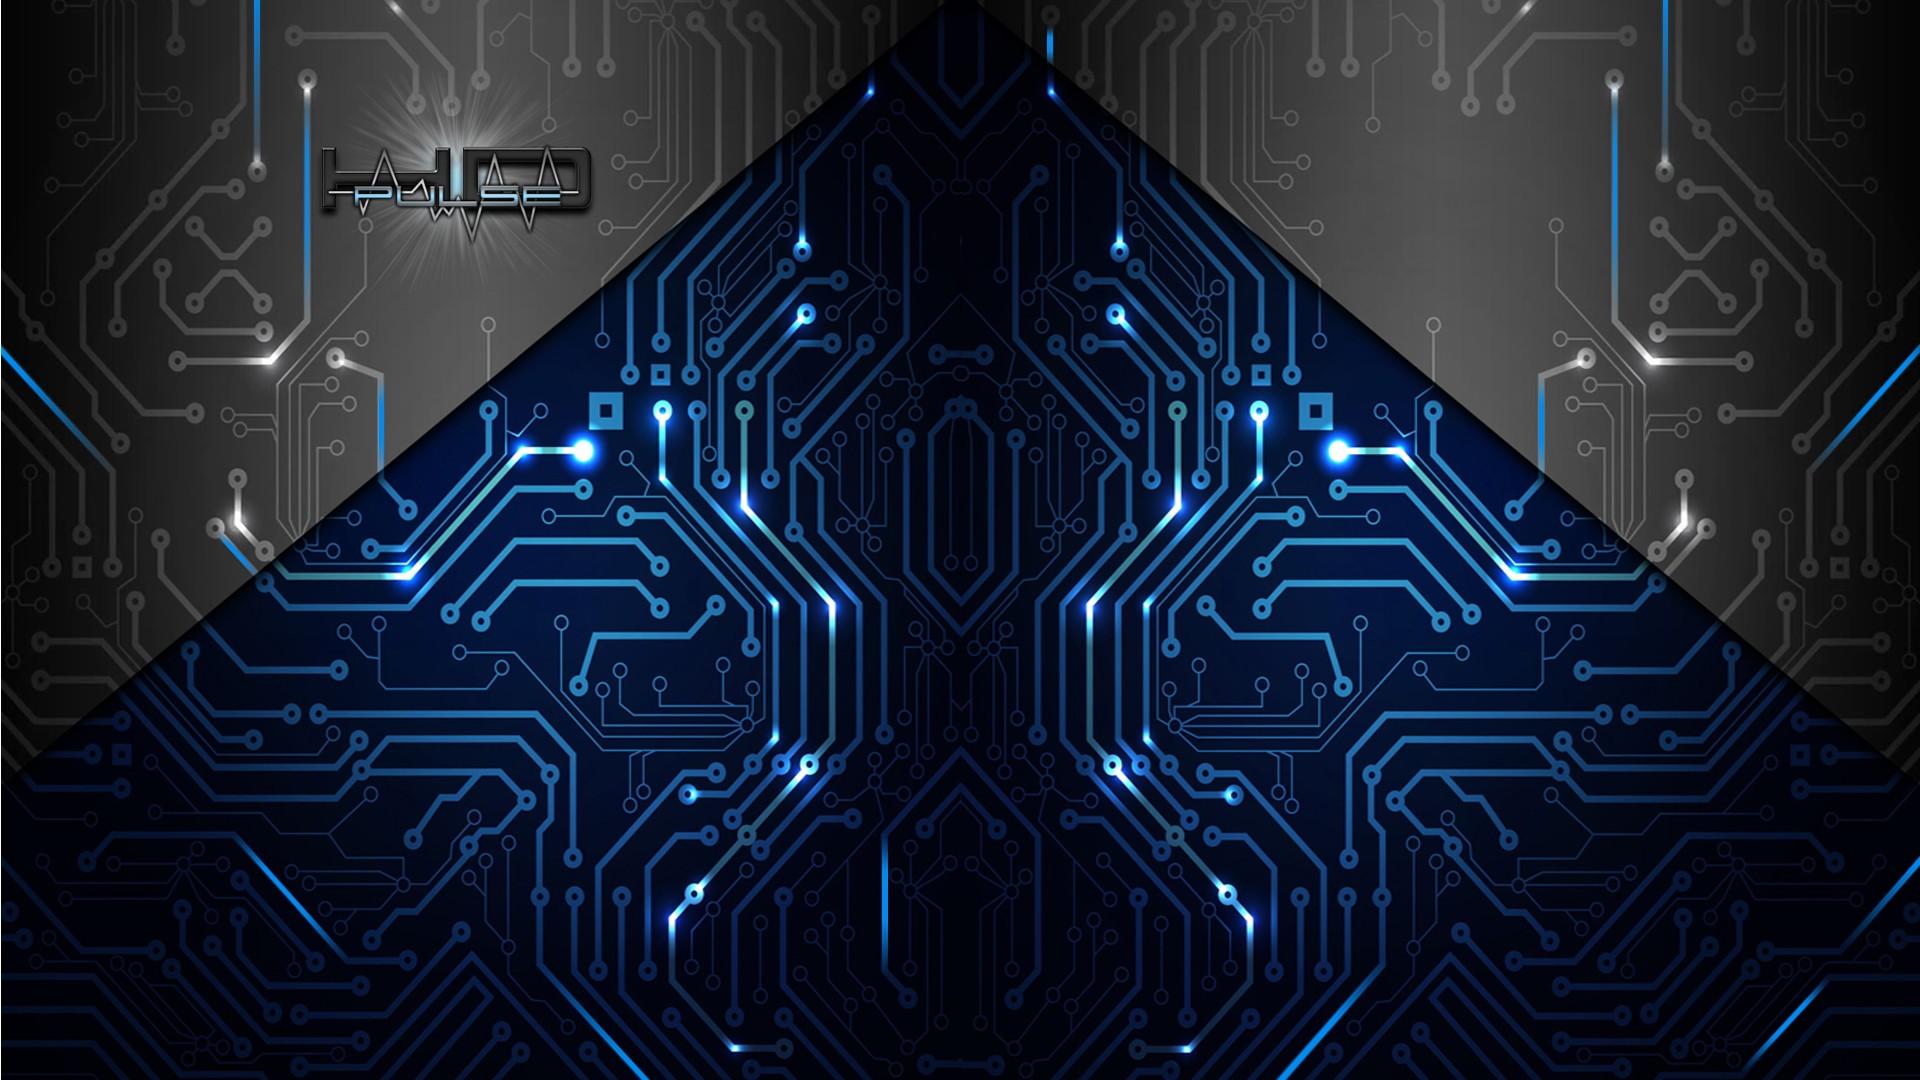 Electronics wallpapers hd wallpapersafari - Circuit board wallpaper android ...